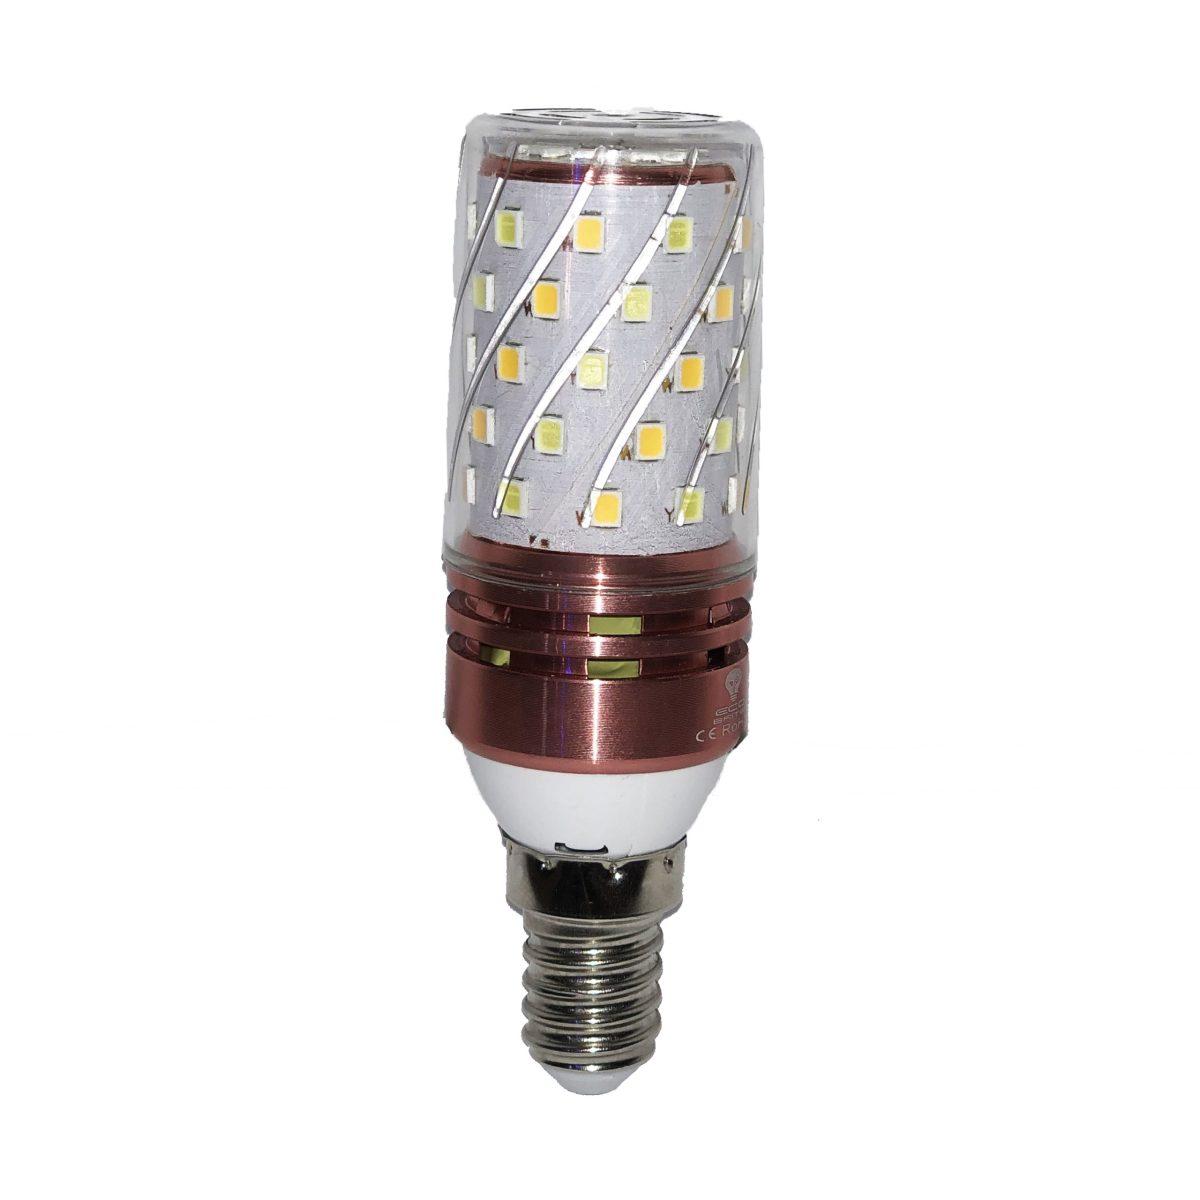 SMD Filament LED three colour change bulb